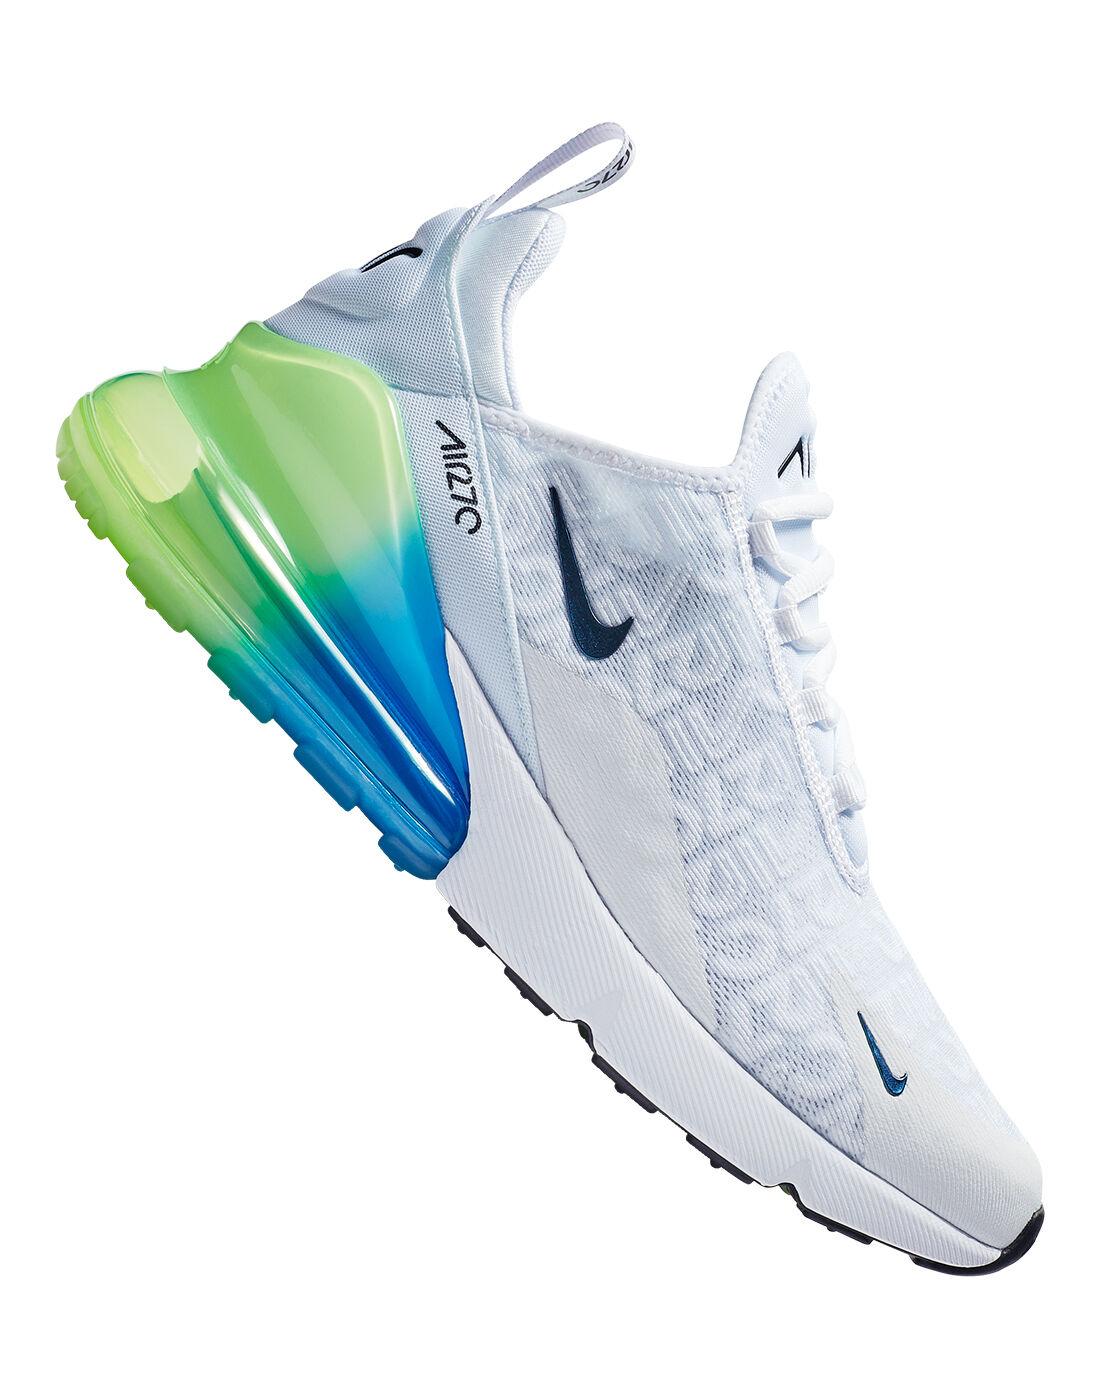 Men's White, Blue & Green Nike Air Max 270 | Life style Sports